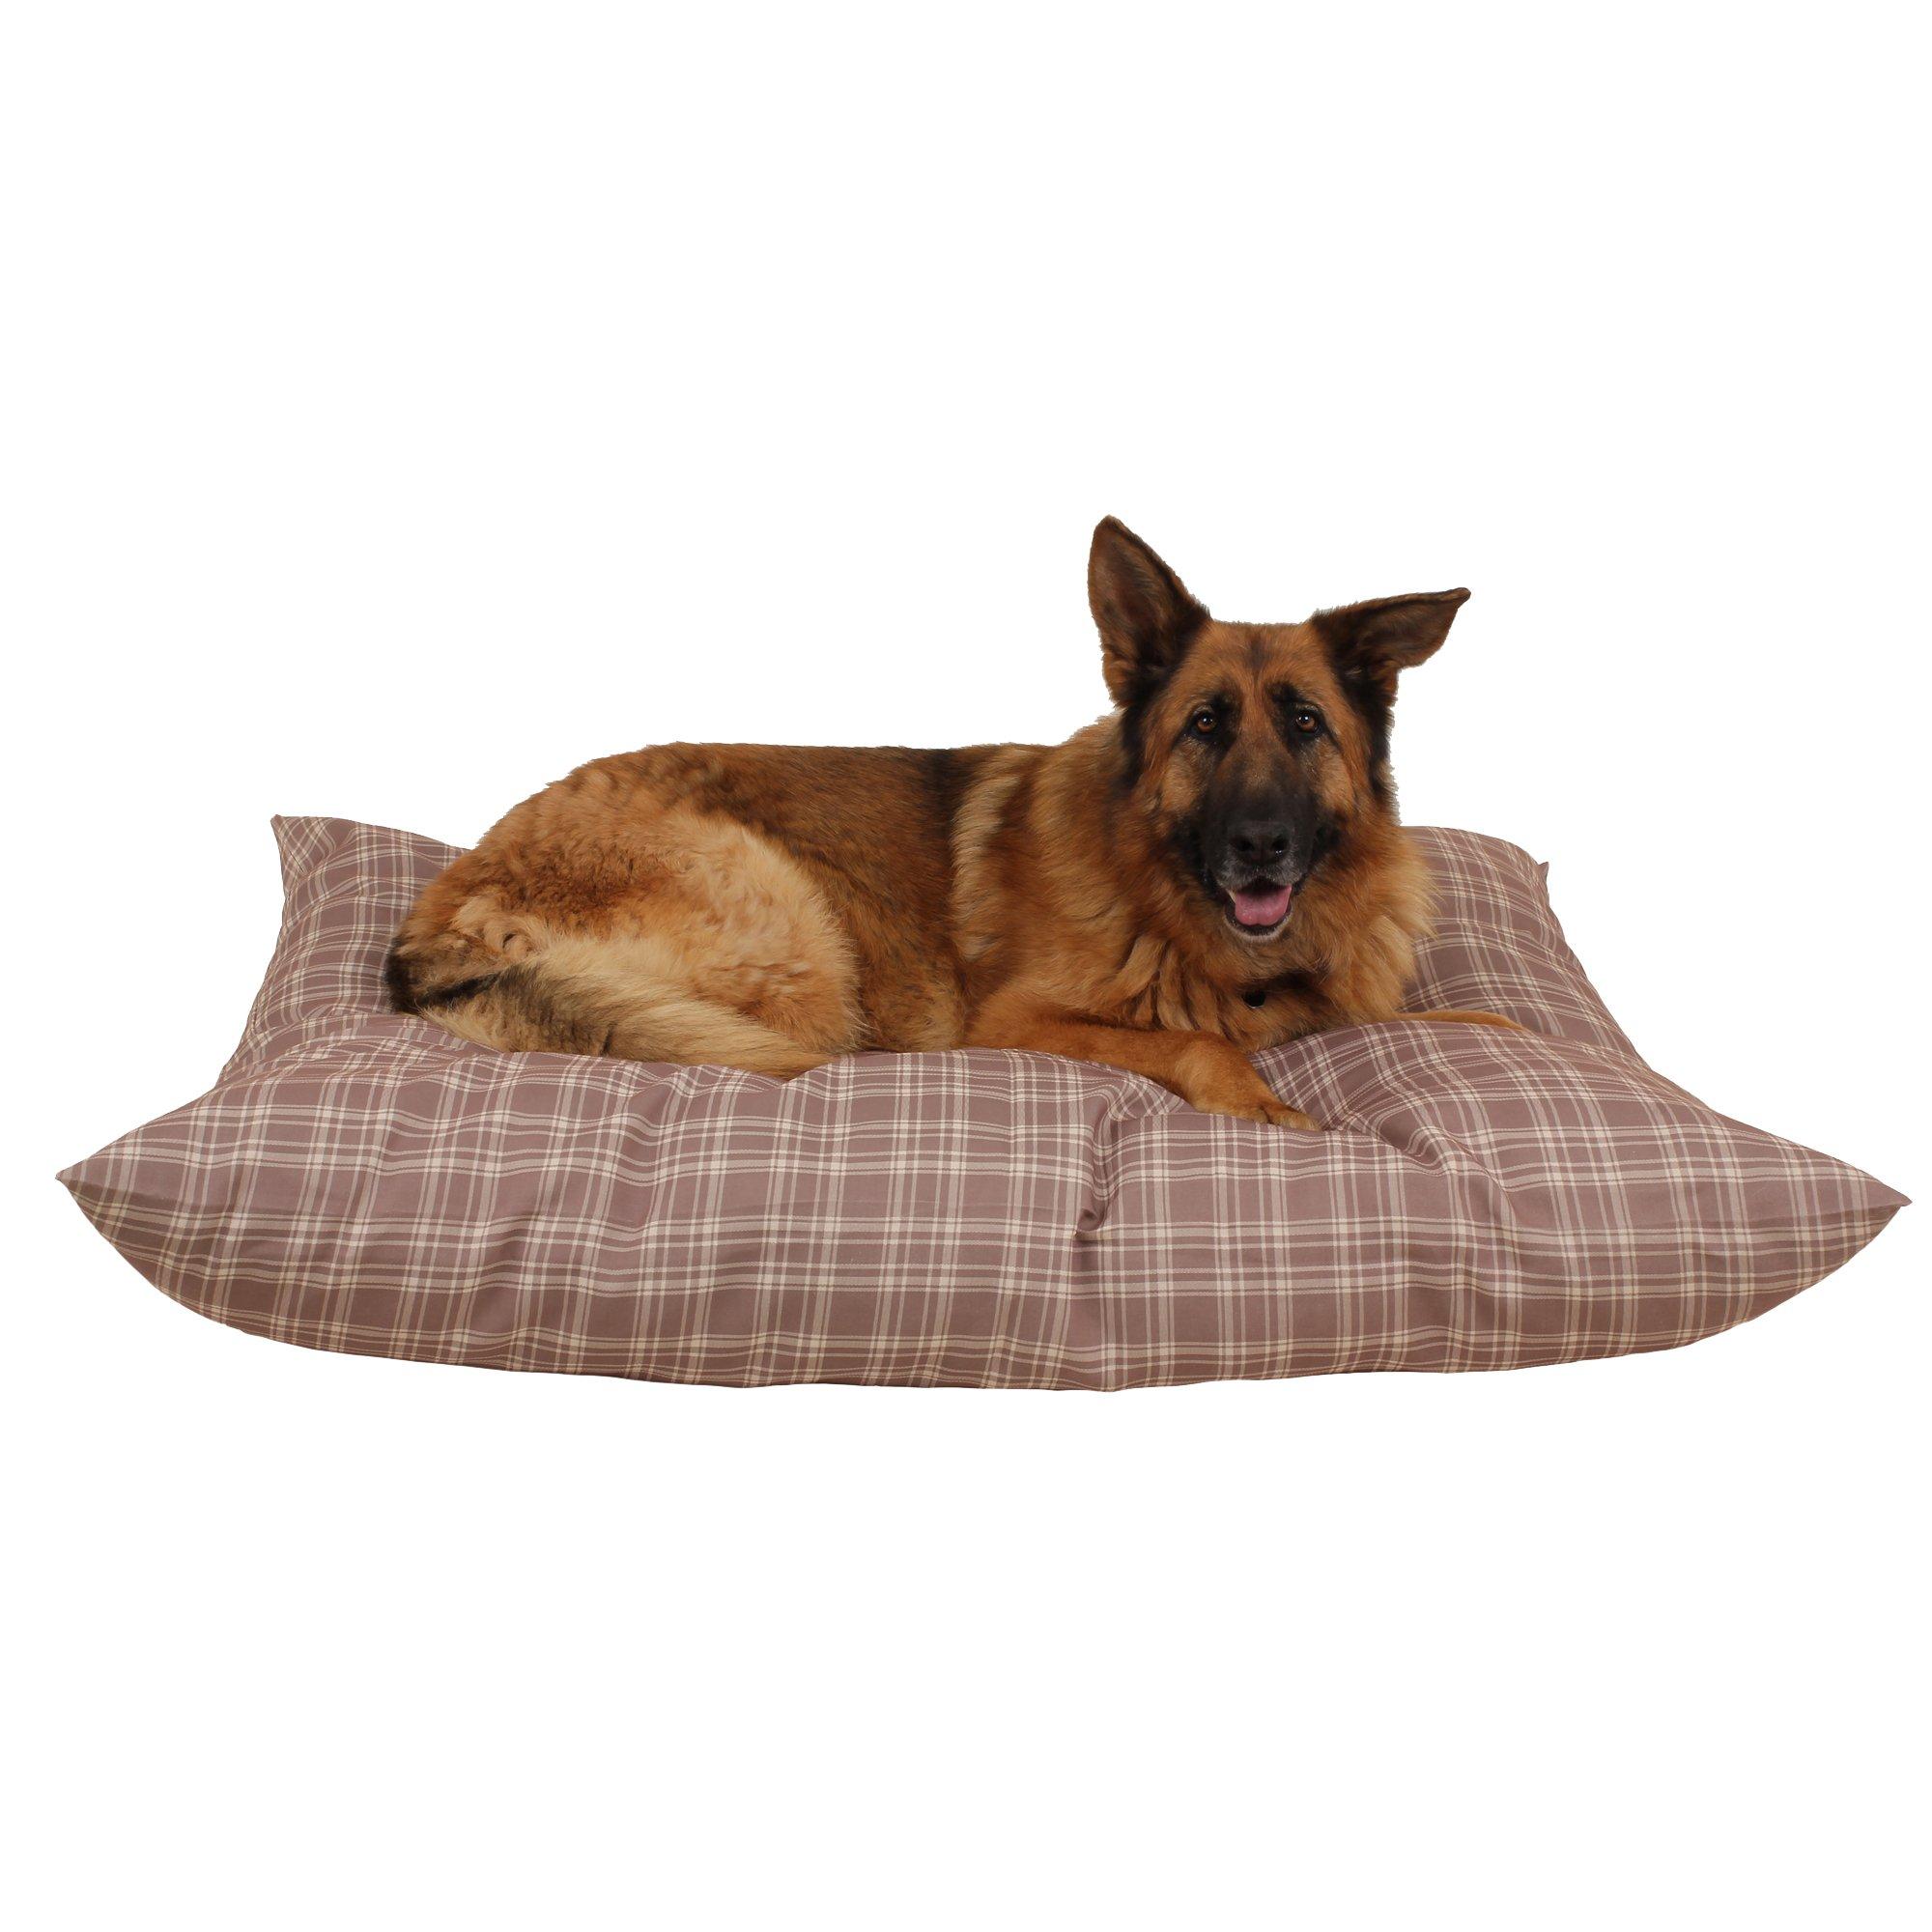 Carolina Pet Company Tan Plaid Indoor Outdoor Shebang Dog Bed